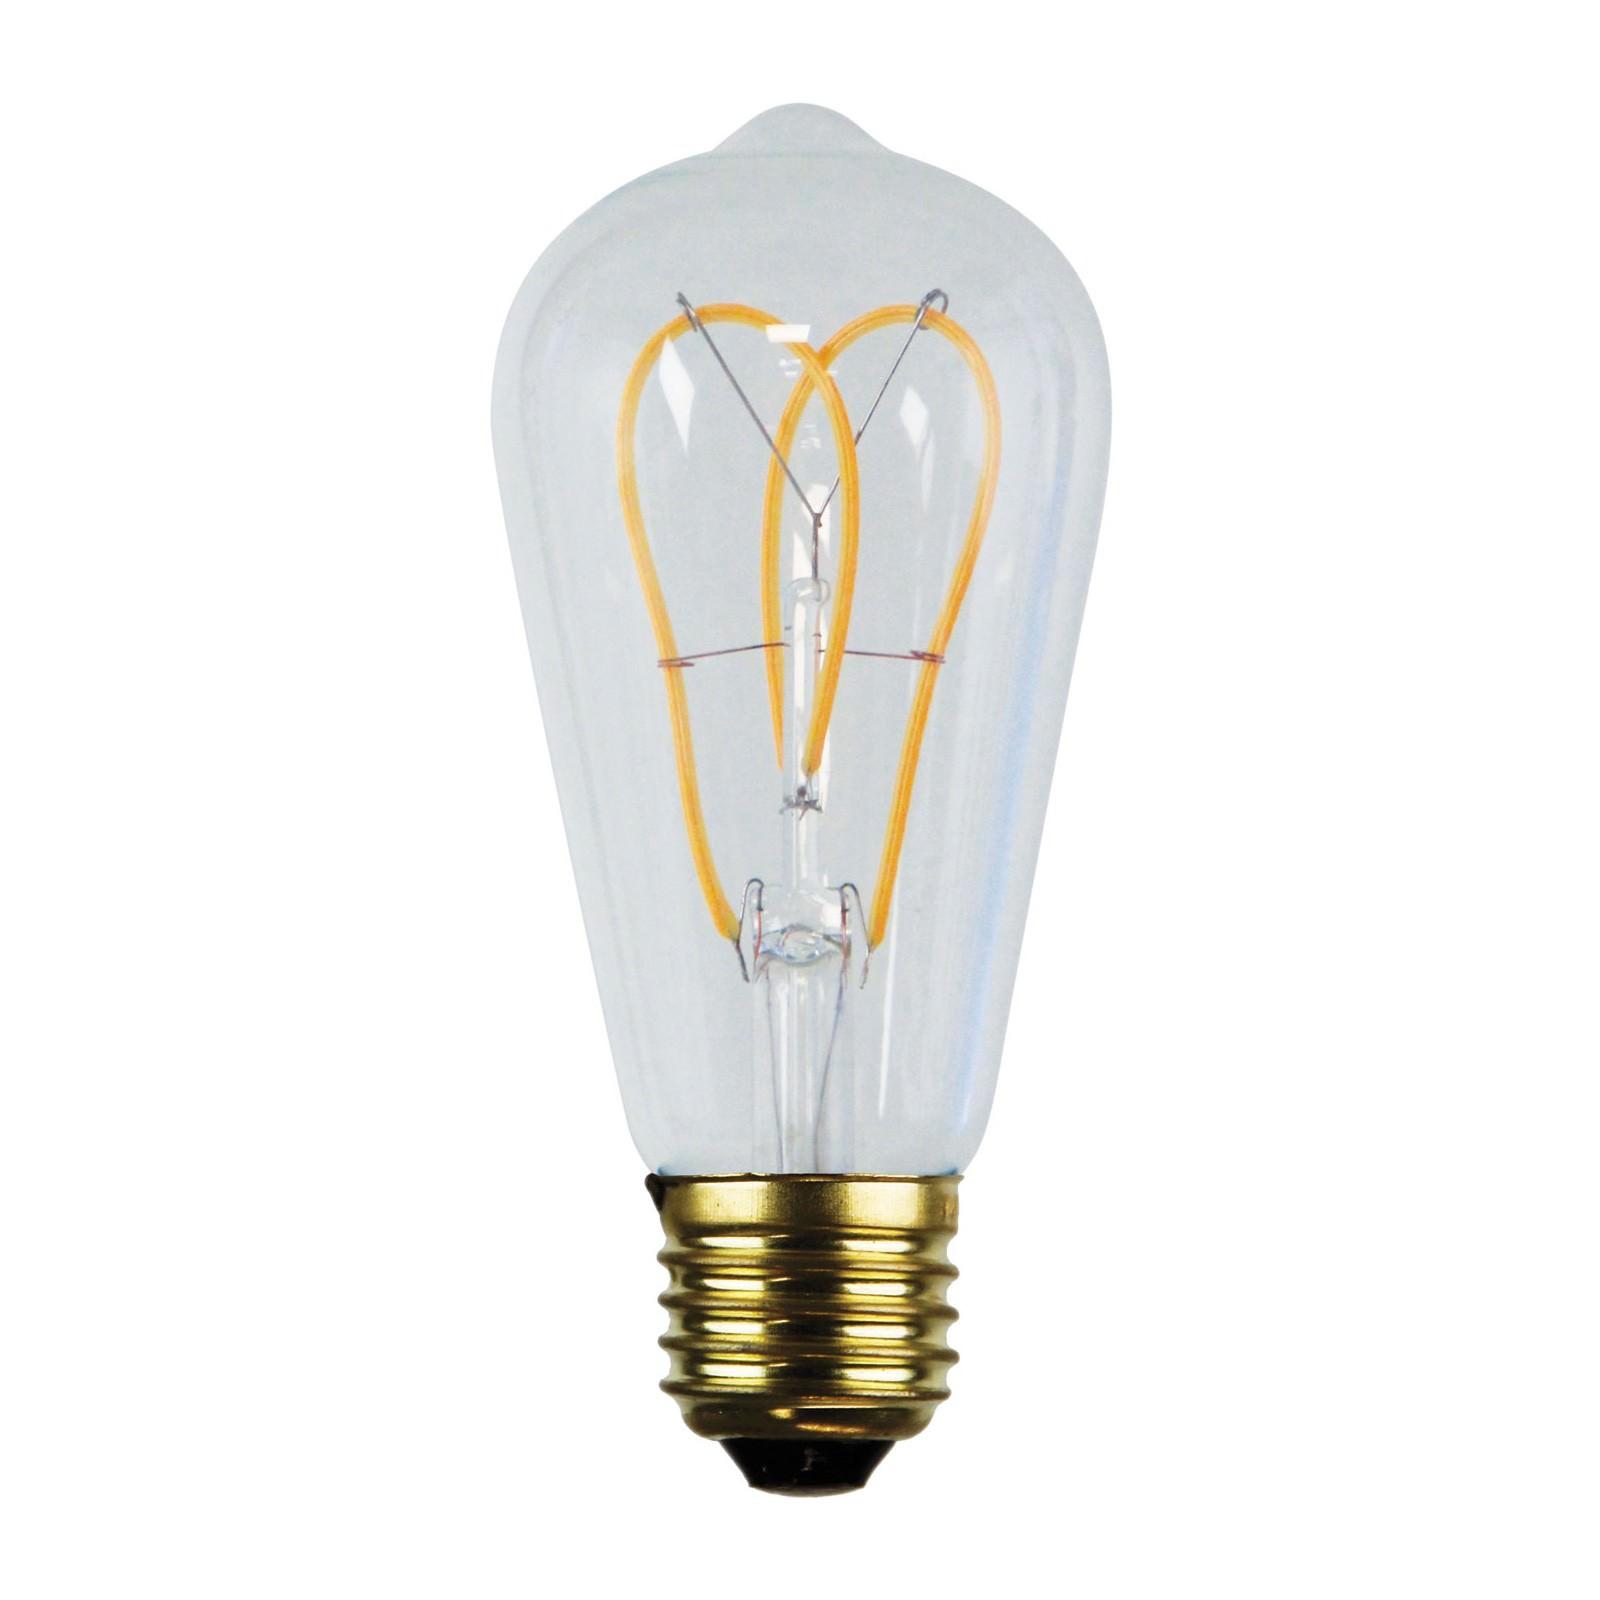 Allume Dimmable LED Twin Loop Filament Globe, E27, 2200K, ST64 Shape